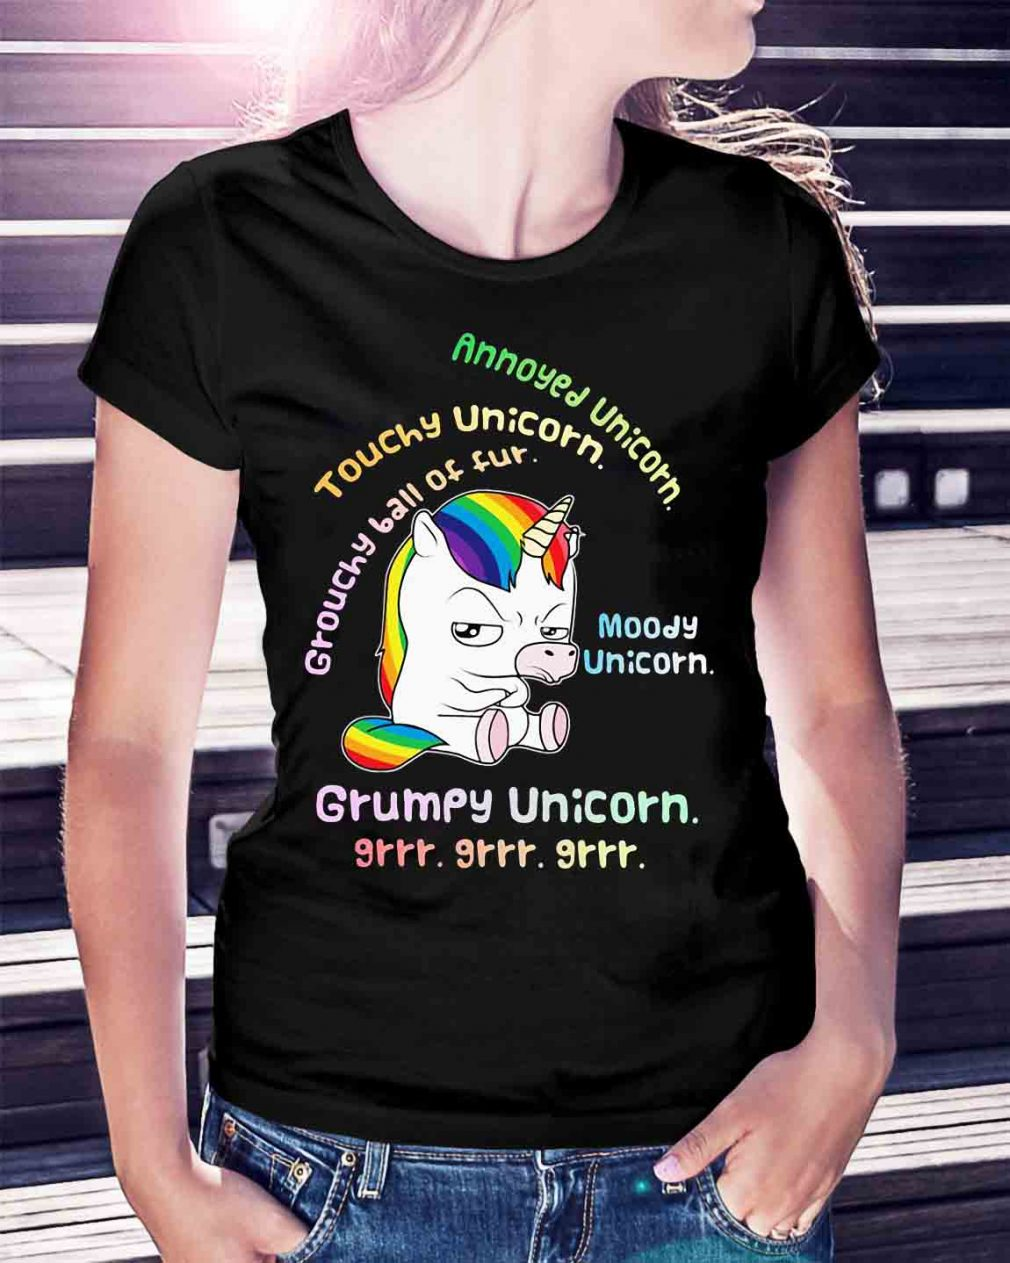 Grumpy Unicorn annoyed unicorn touchy unicorn moody unicorn shirt